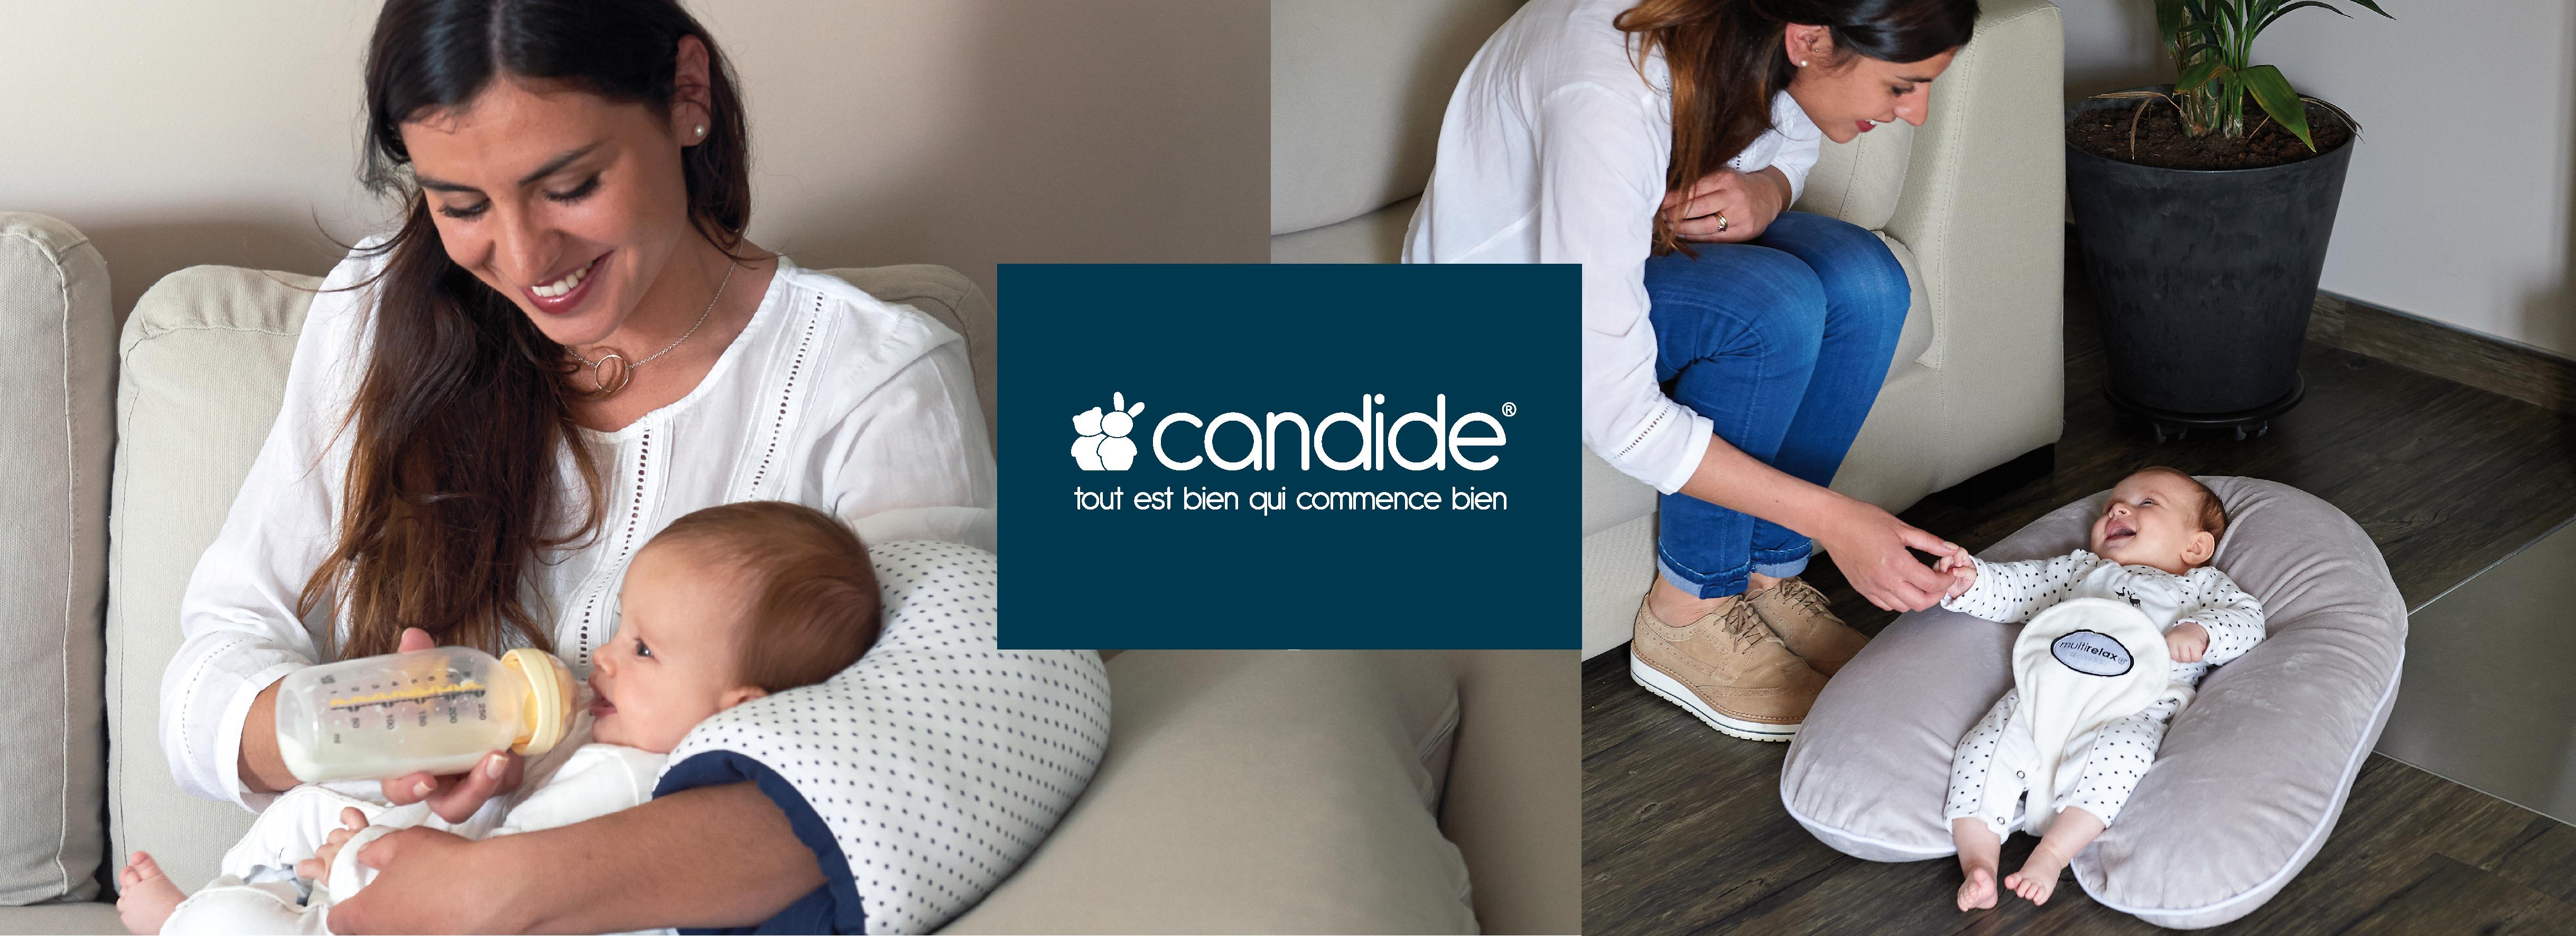 Candide Multirelax